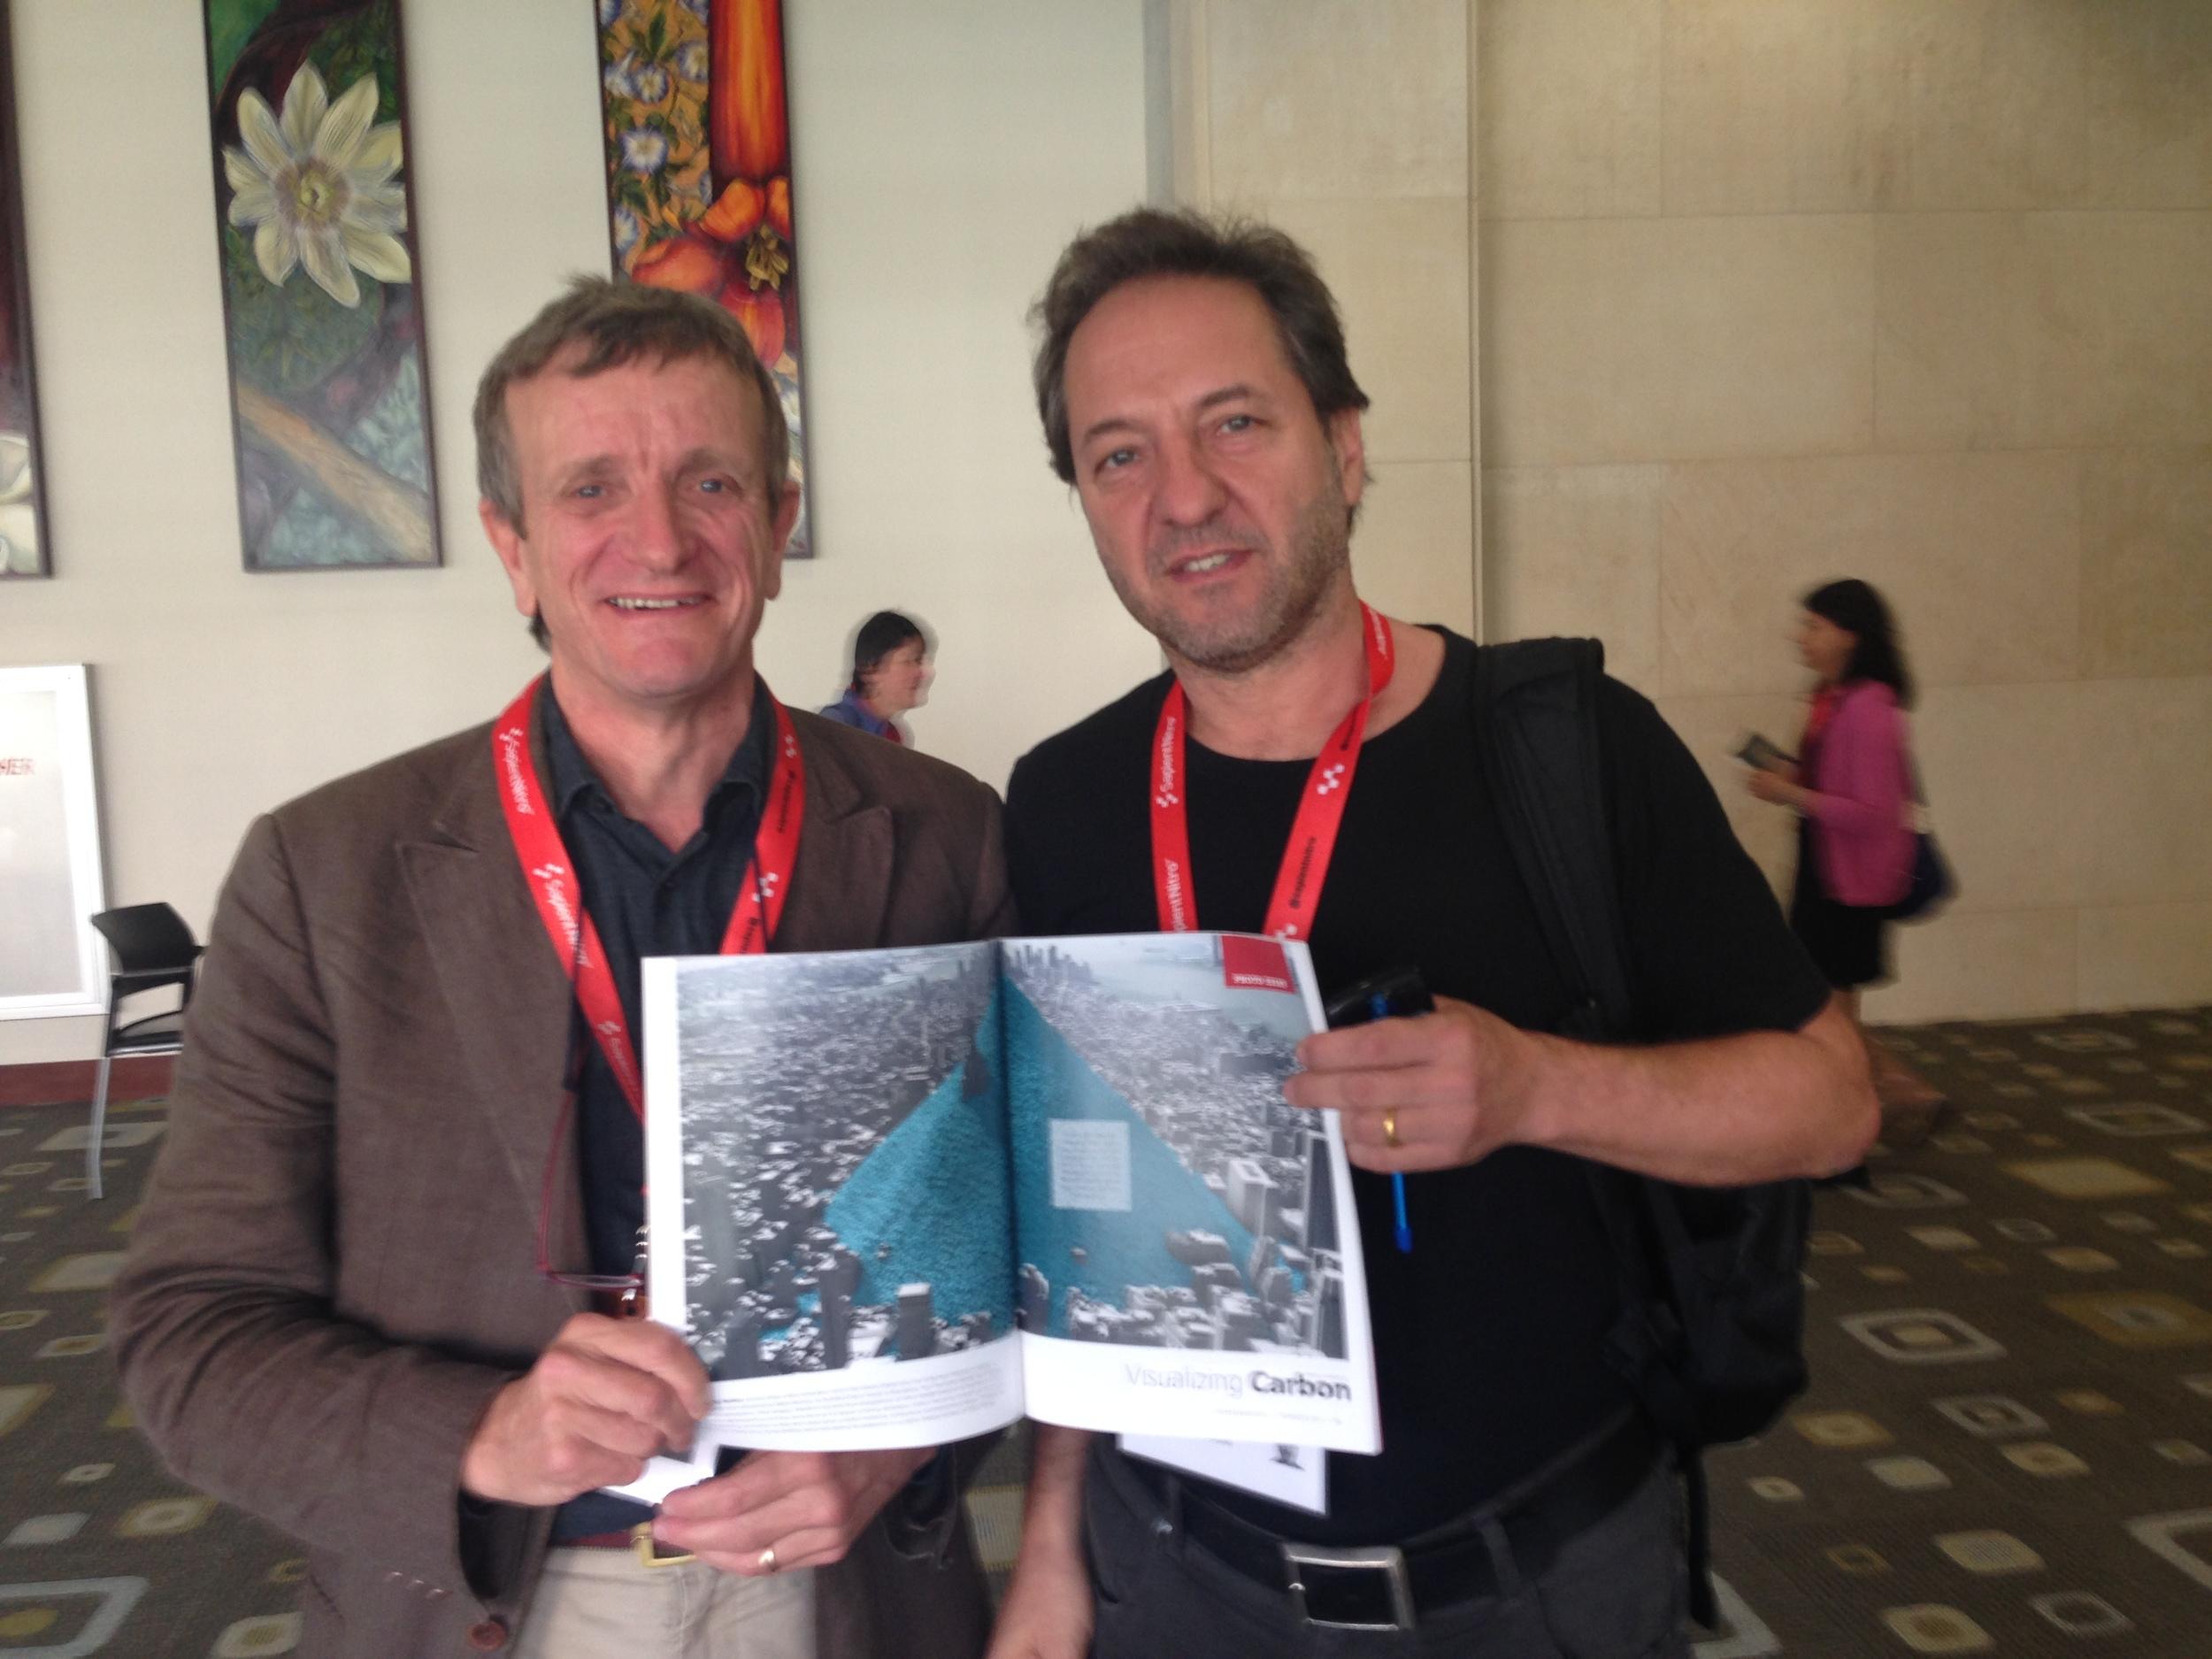 Antony Turner and Jo Confino at SXSW Eco